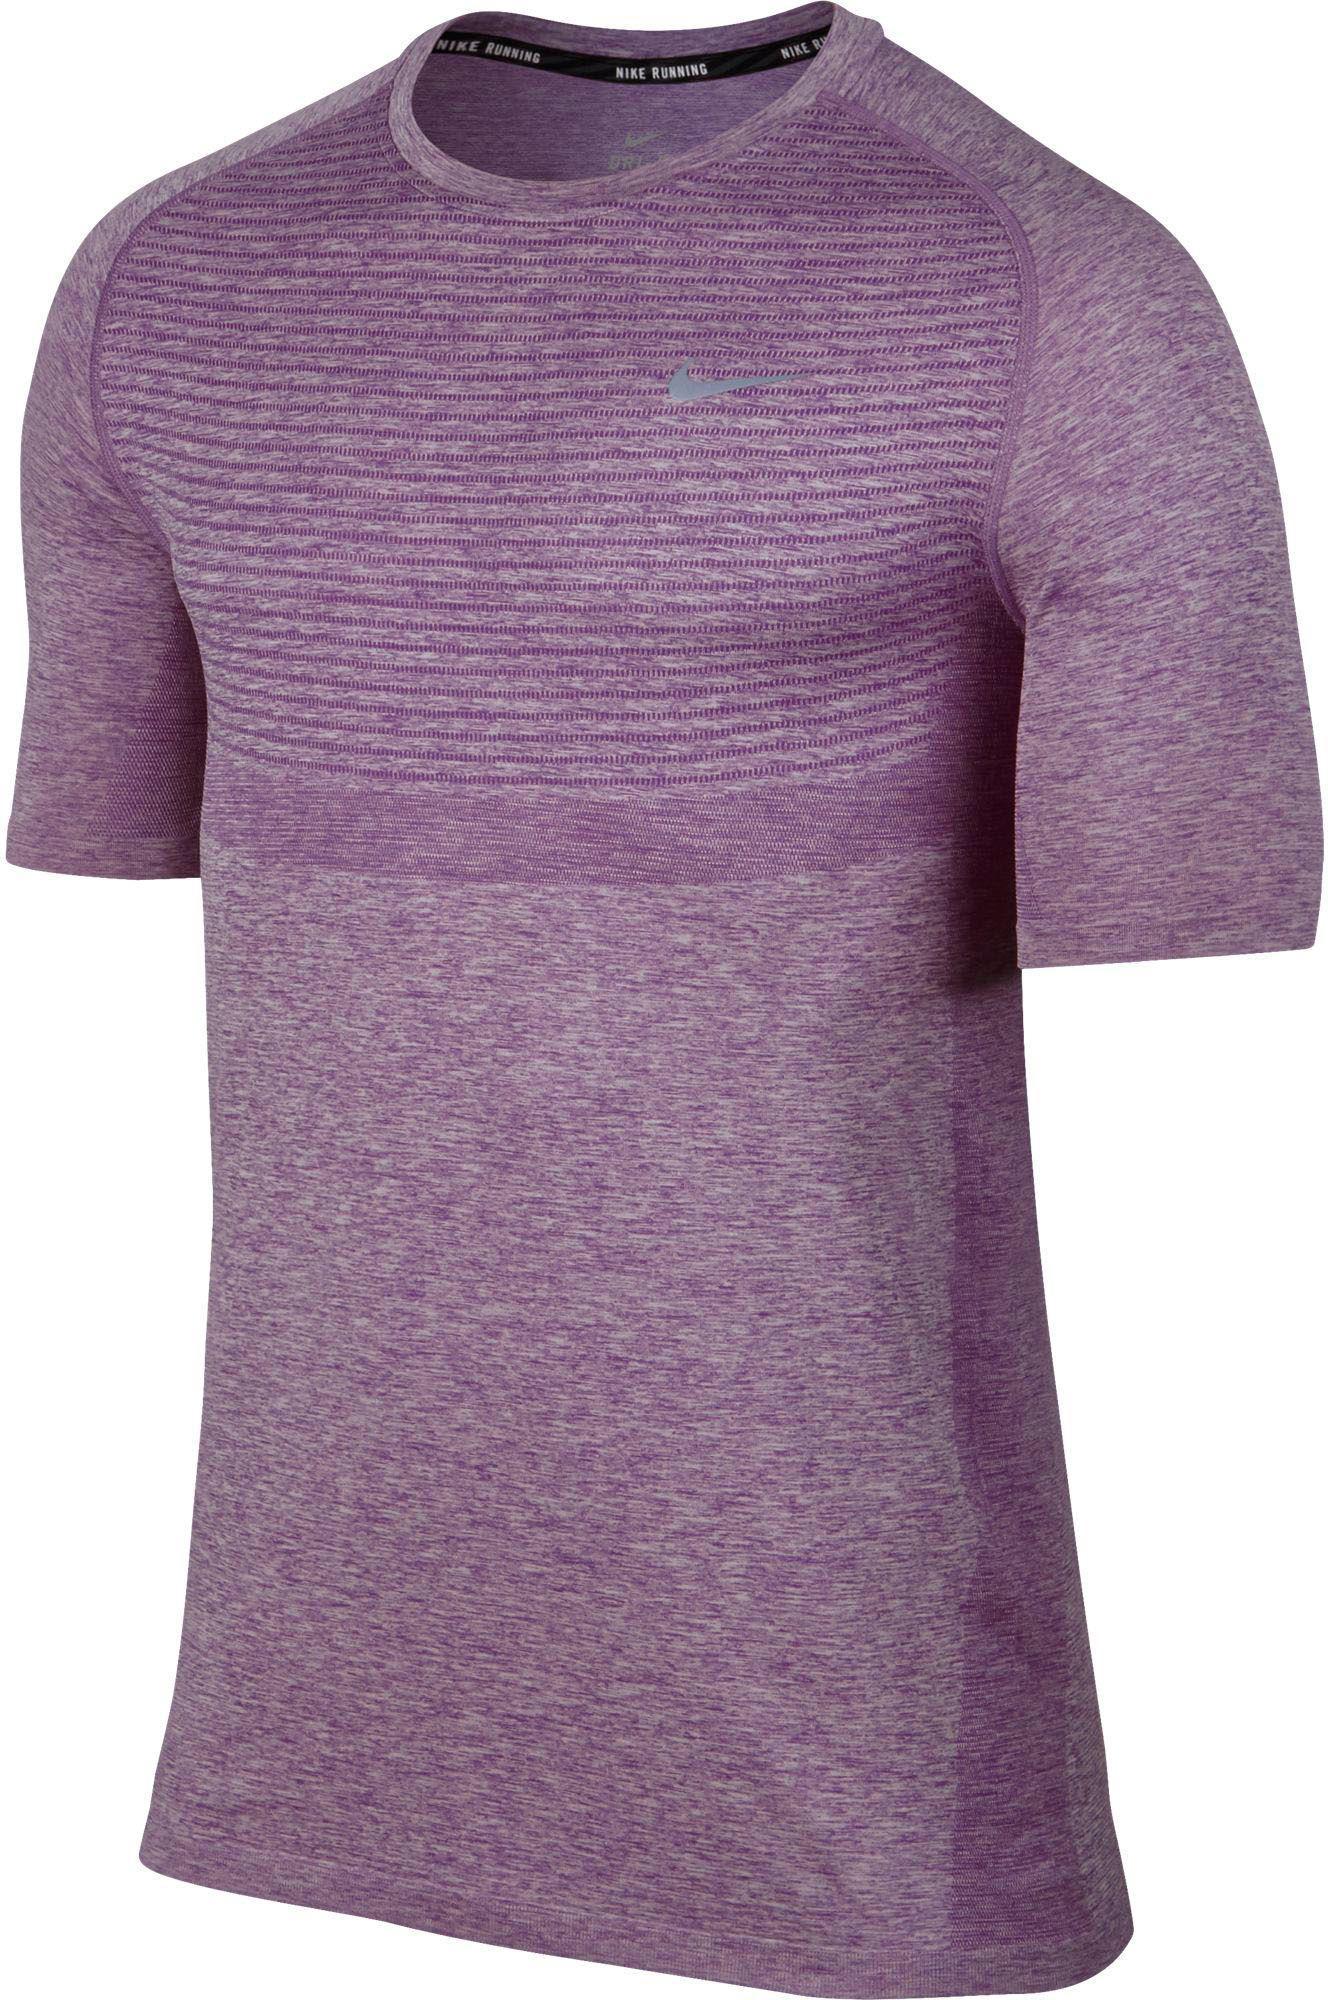 wholesale dealer aa66b 732b1 Nike Dri Fit Knit T Shirt Mens